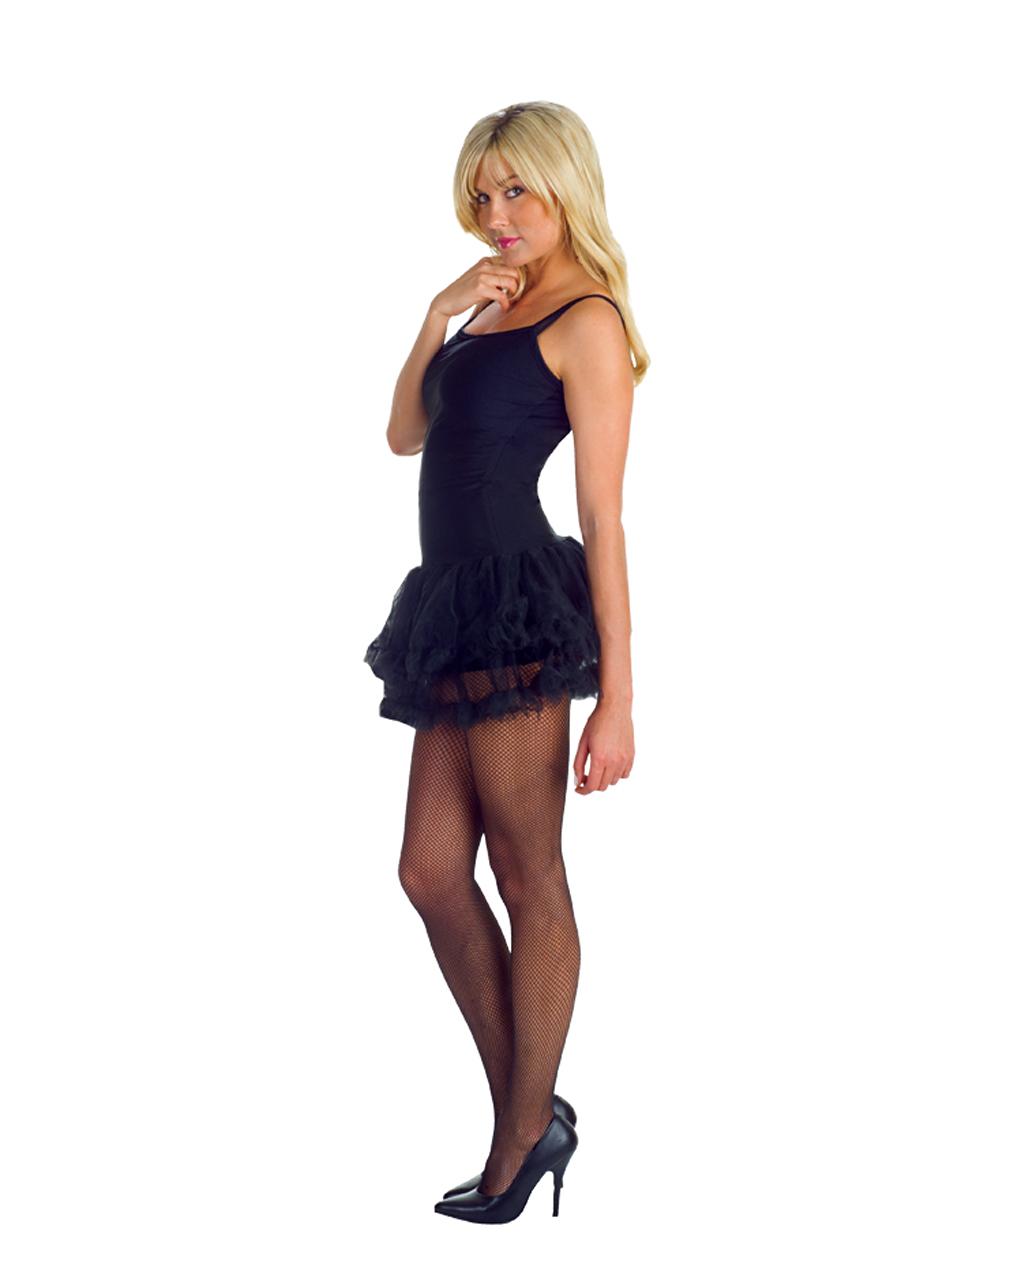 Petticoat Kleid schwarz als sexy Kostüm | Horror-Shop.com